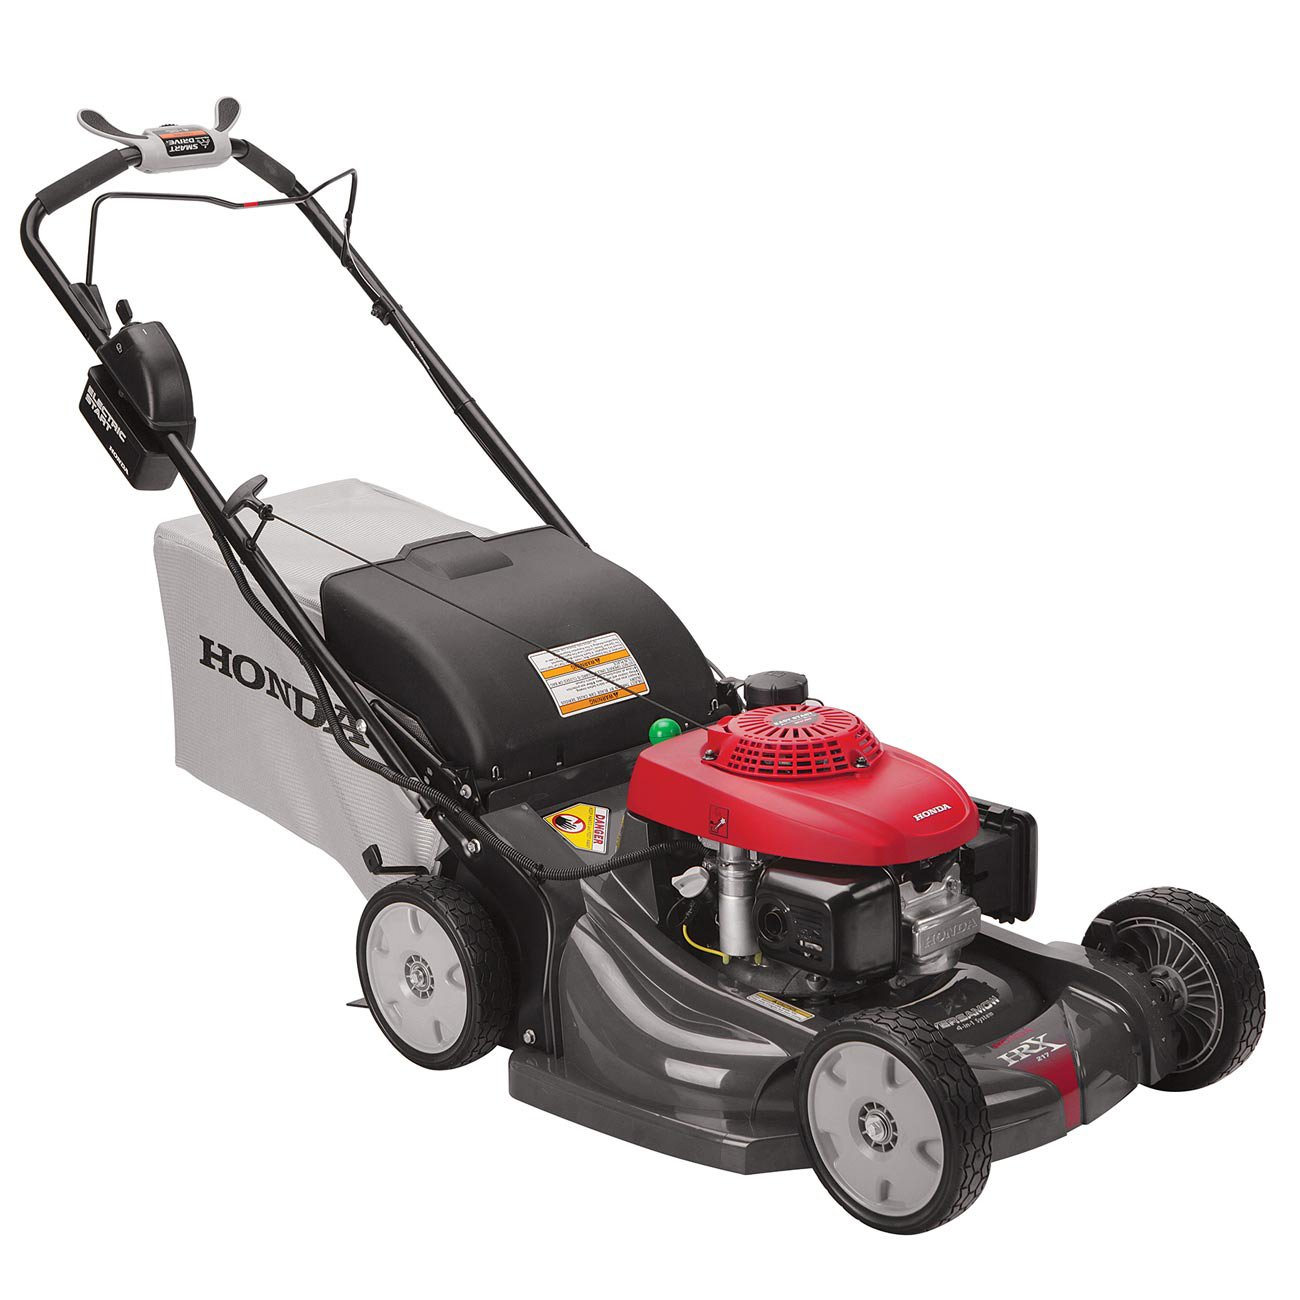 "Amazon.com : Honda HRX217VLA 21"" Walk Behind Lawn Mower w/ Electric Start :  Garden & Outdoor"